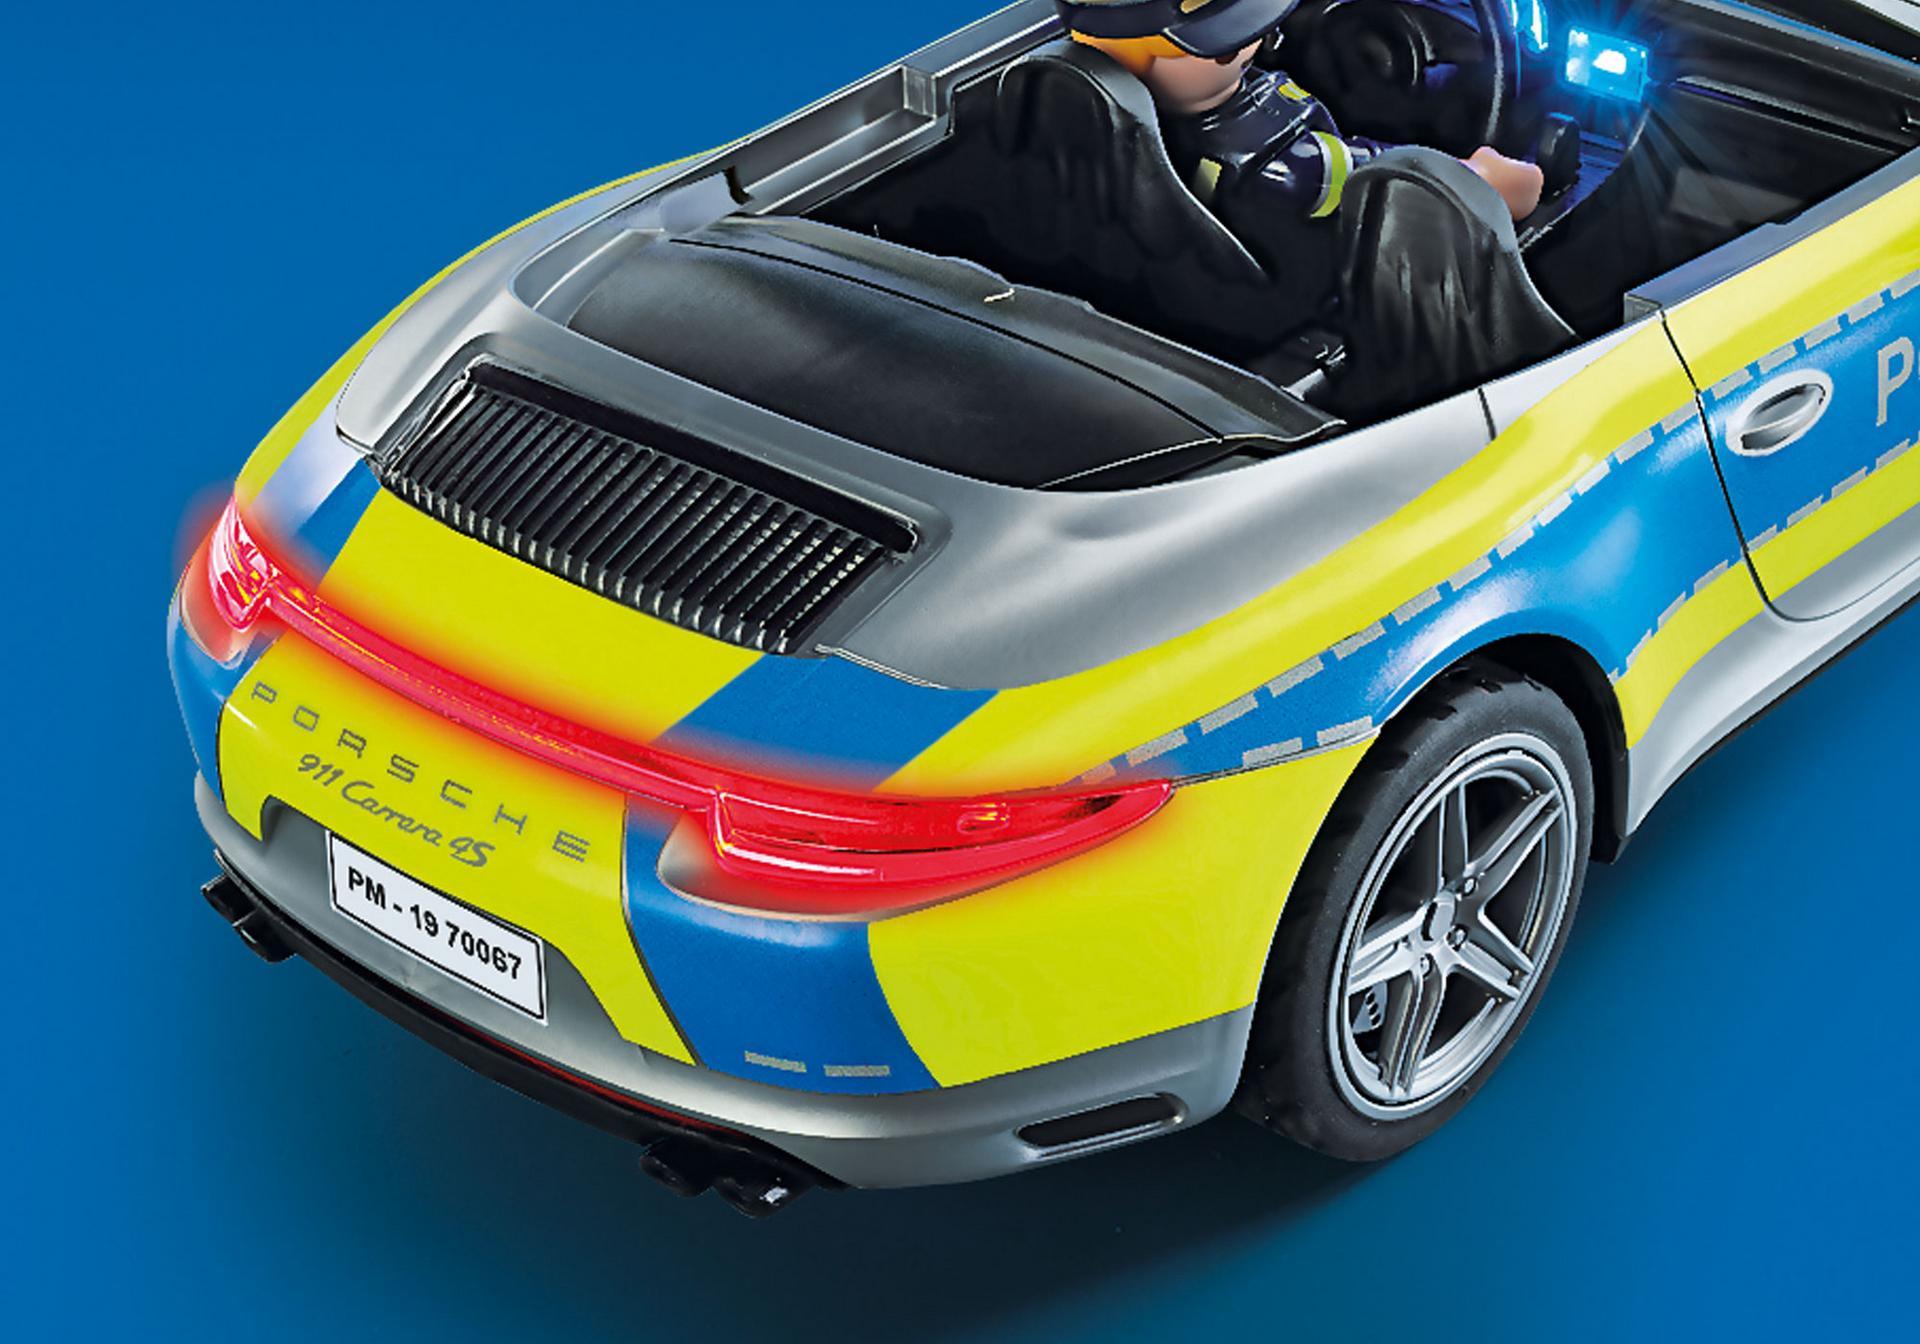 porsche 911 carrera 4s polizei 70067 playmobil schweiz. Black Bedroom Furniture Sets. Home Design Ideas